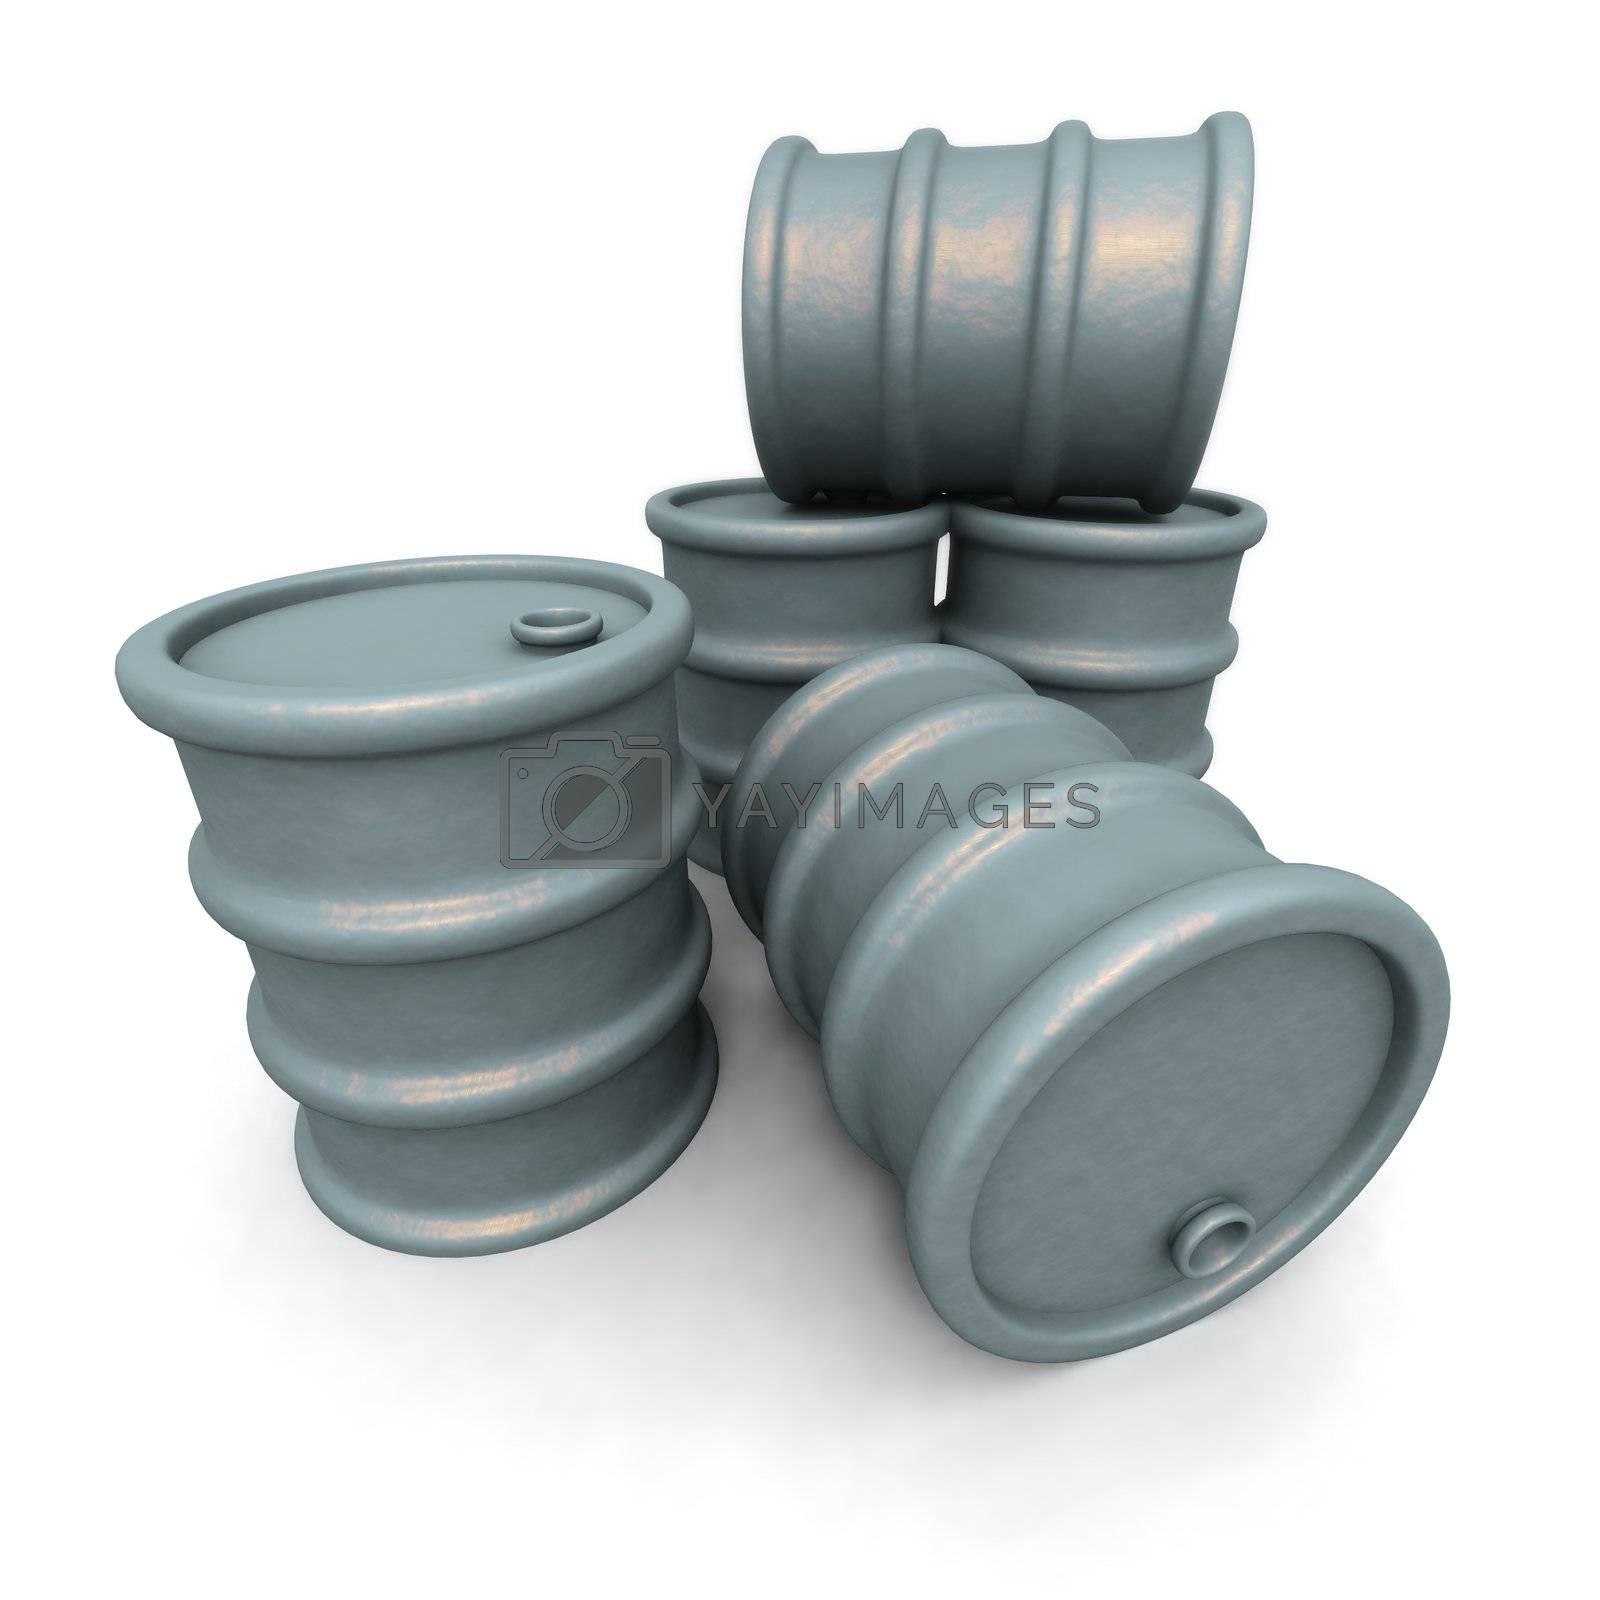 a 3D rendering of some gray barrels